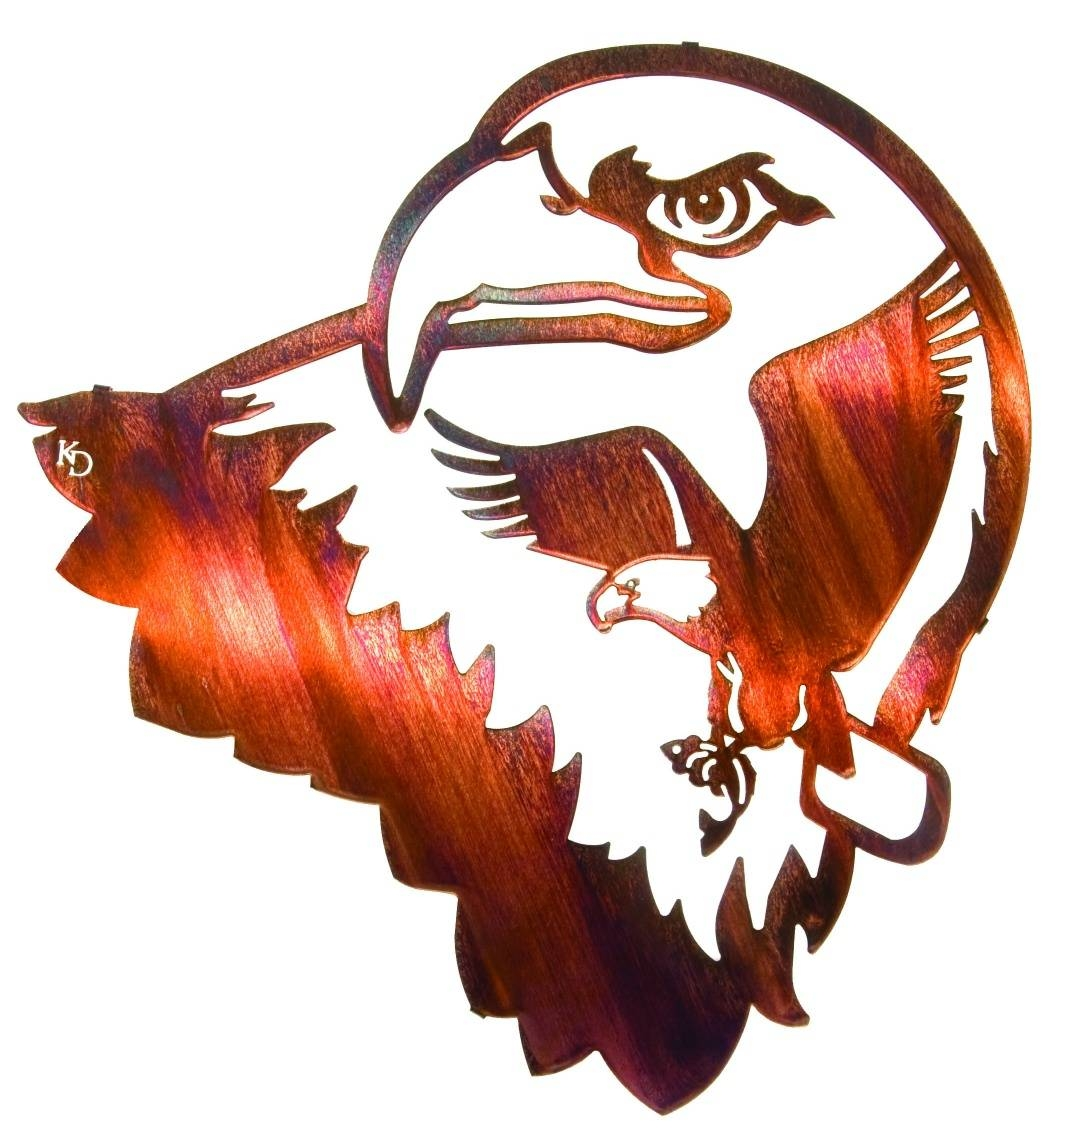 Liberty Eaglekathryn Darling – Nature Metal Wall Art For Best And Newest Nature Metal Wall Art (View 6 of 20)